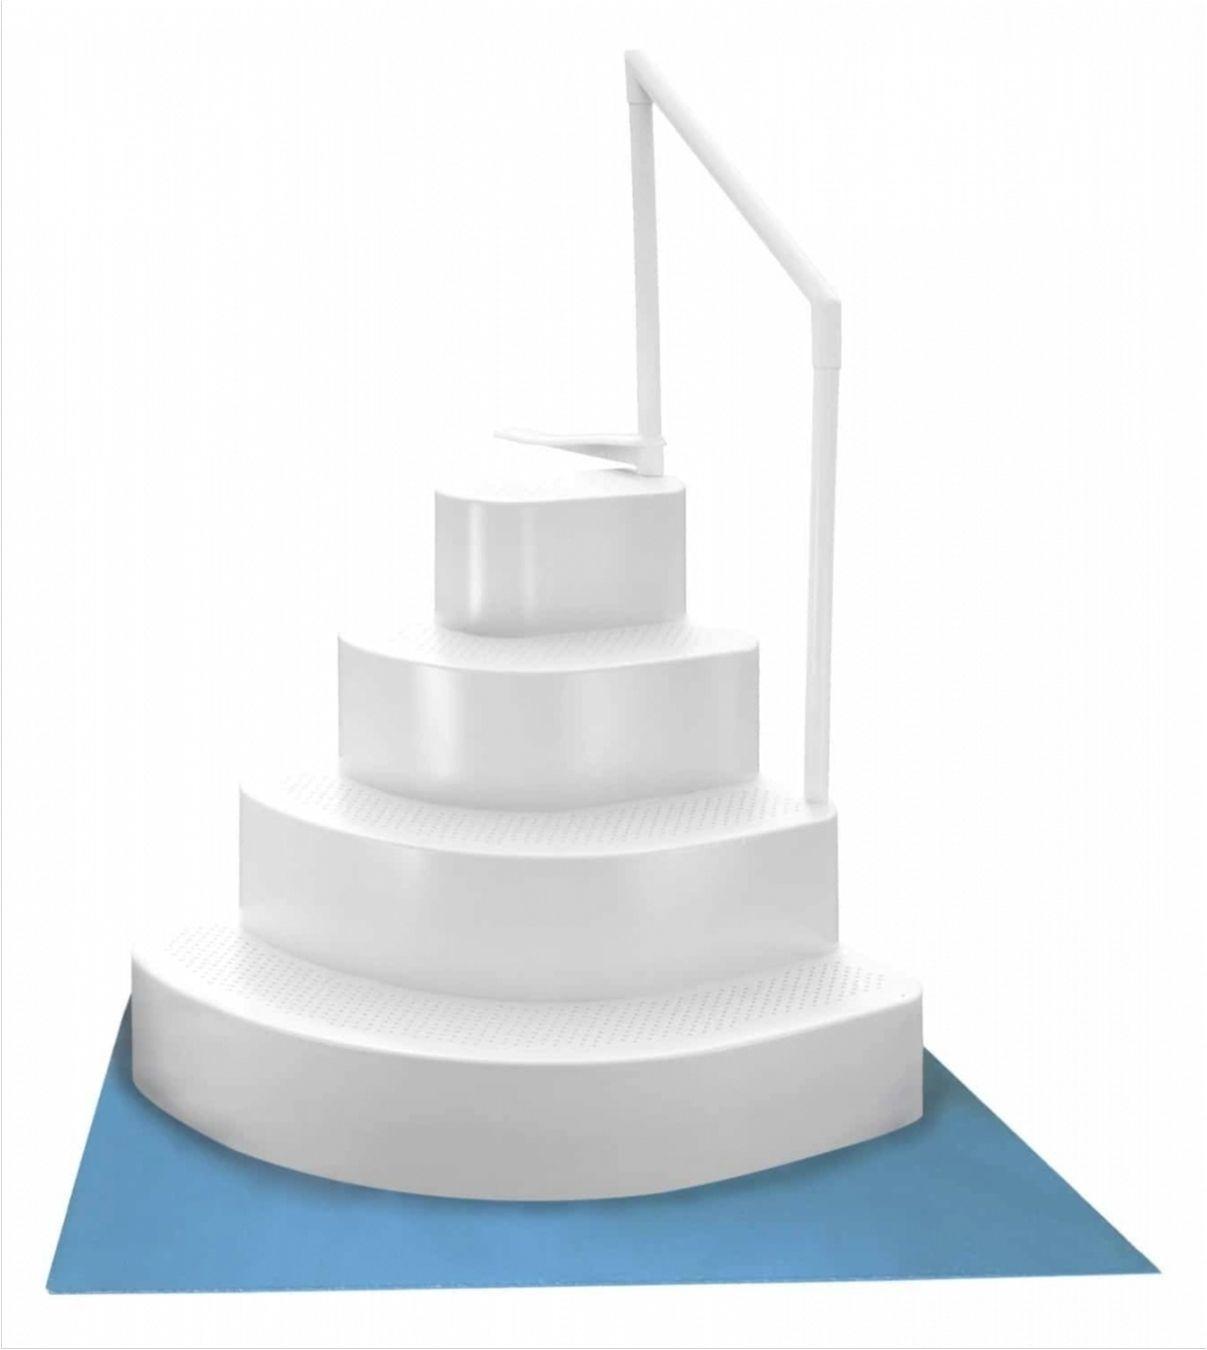 Wedding Cake Style Pool Steps Above Ground Pool Steps Pool Steps Above Ground Pool Ladders